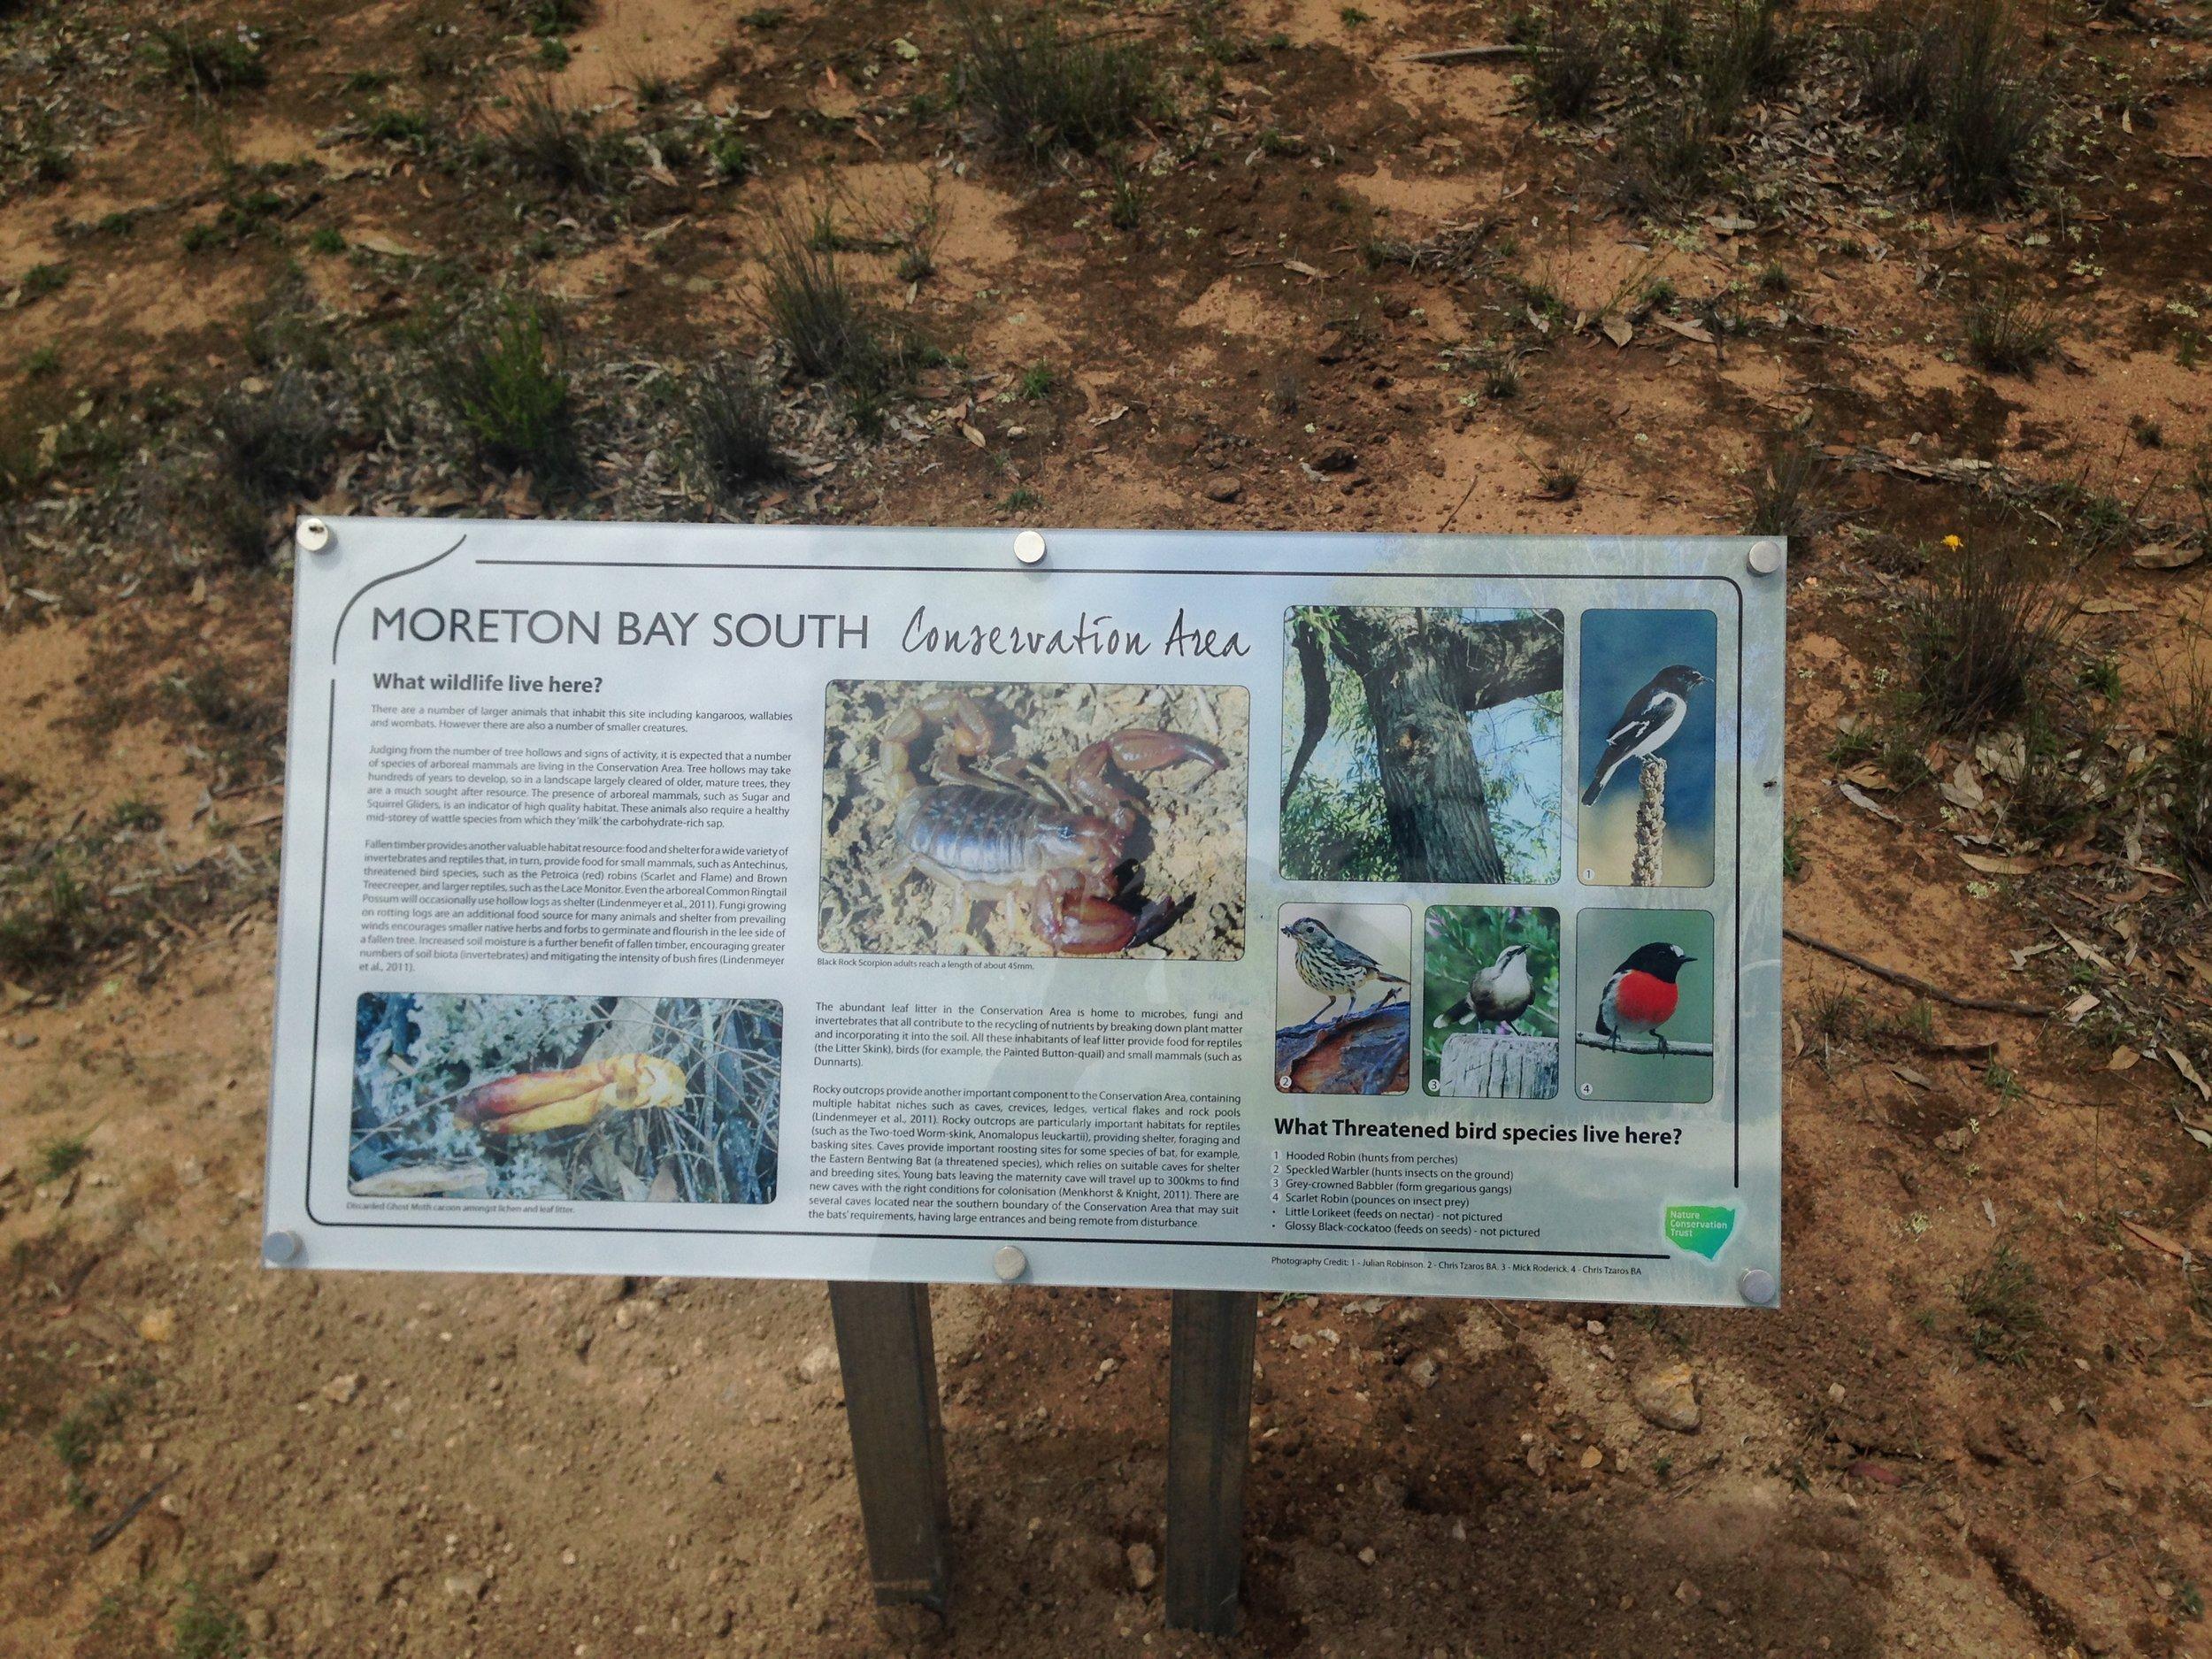 Visit My Farm Australia - Moreton Bay South, Duneedoo NSW